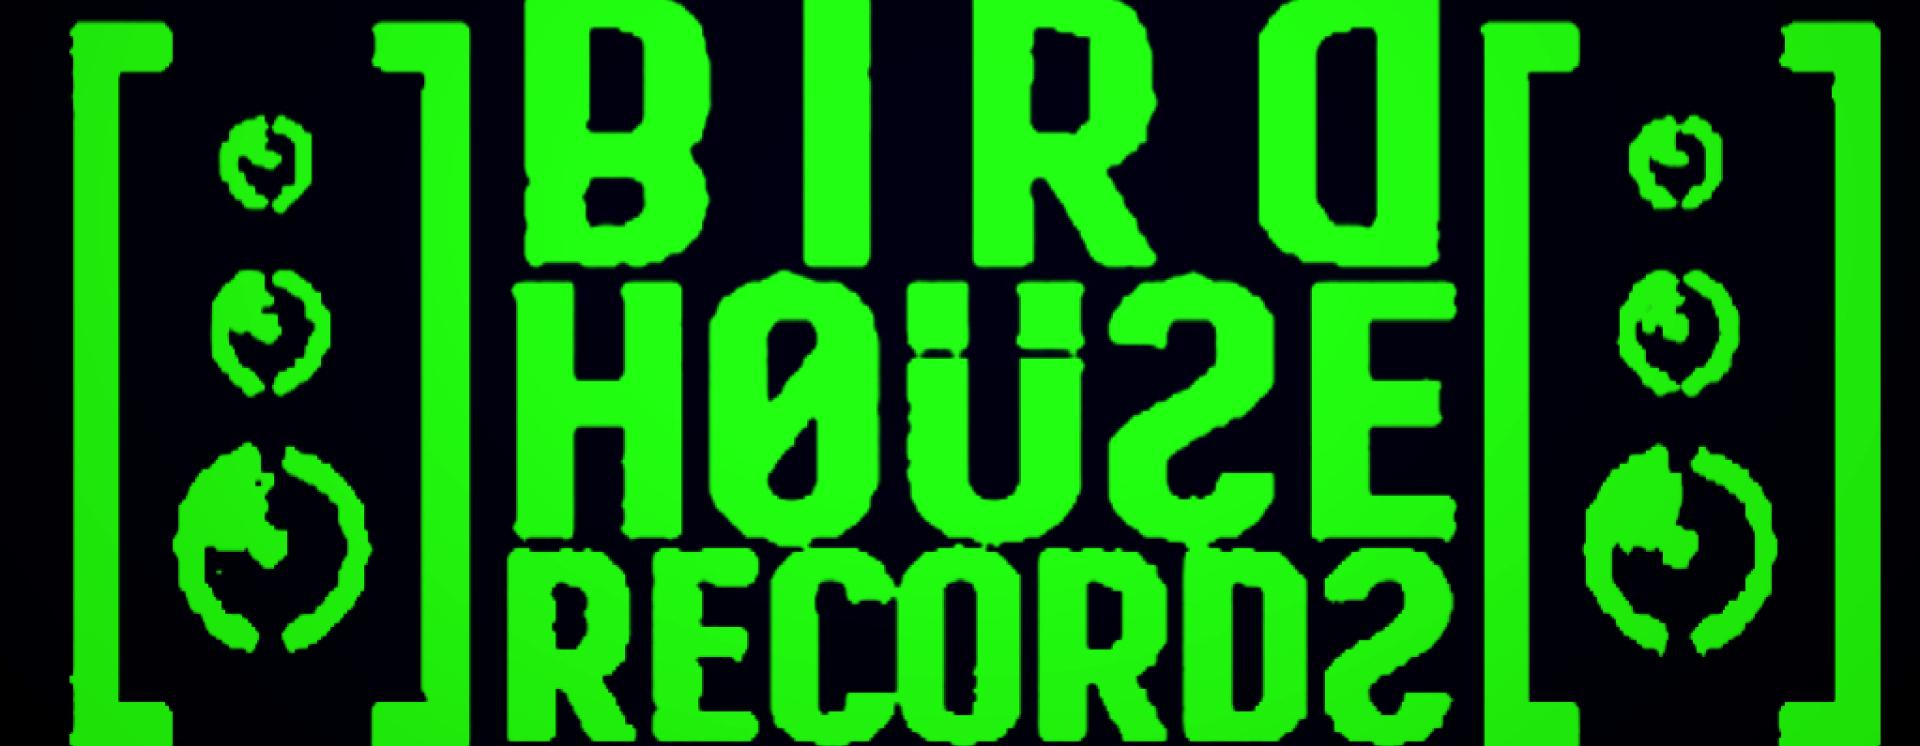 Large birdhouse logo copy